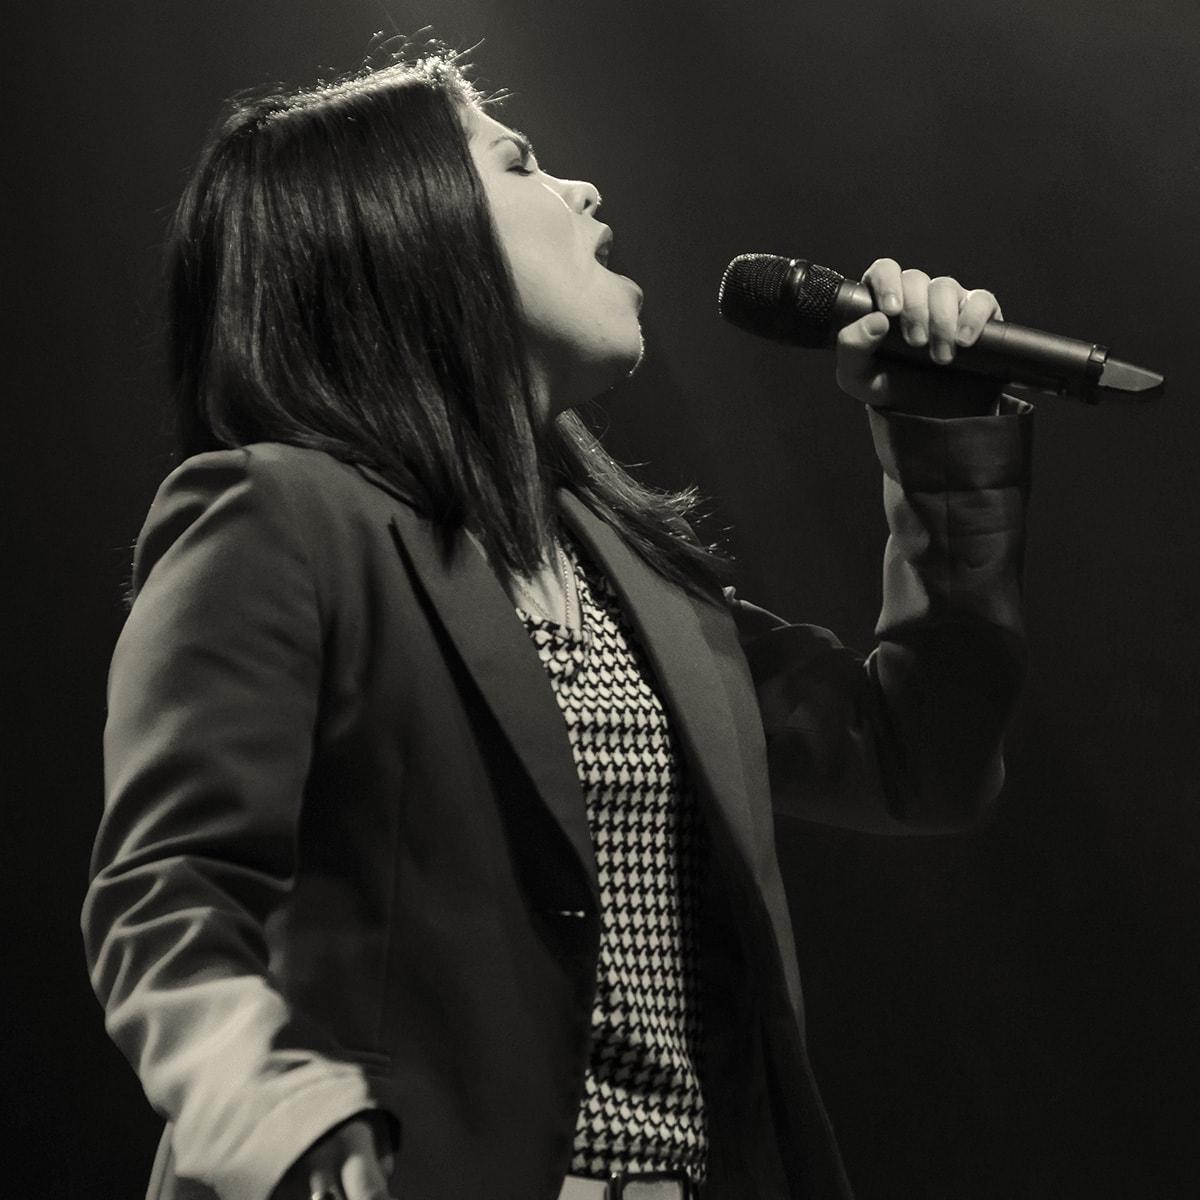 Anita Valiente